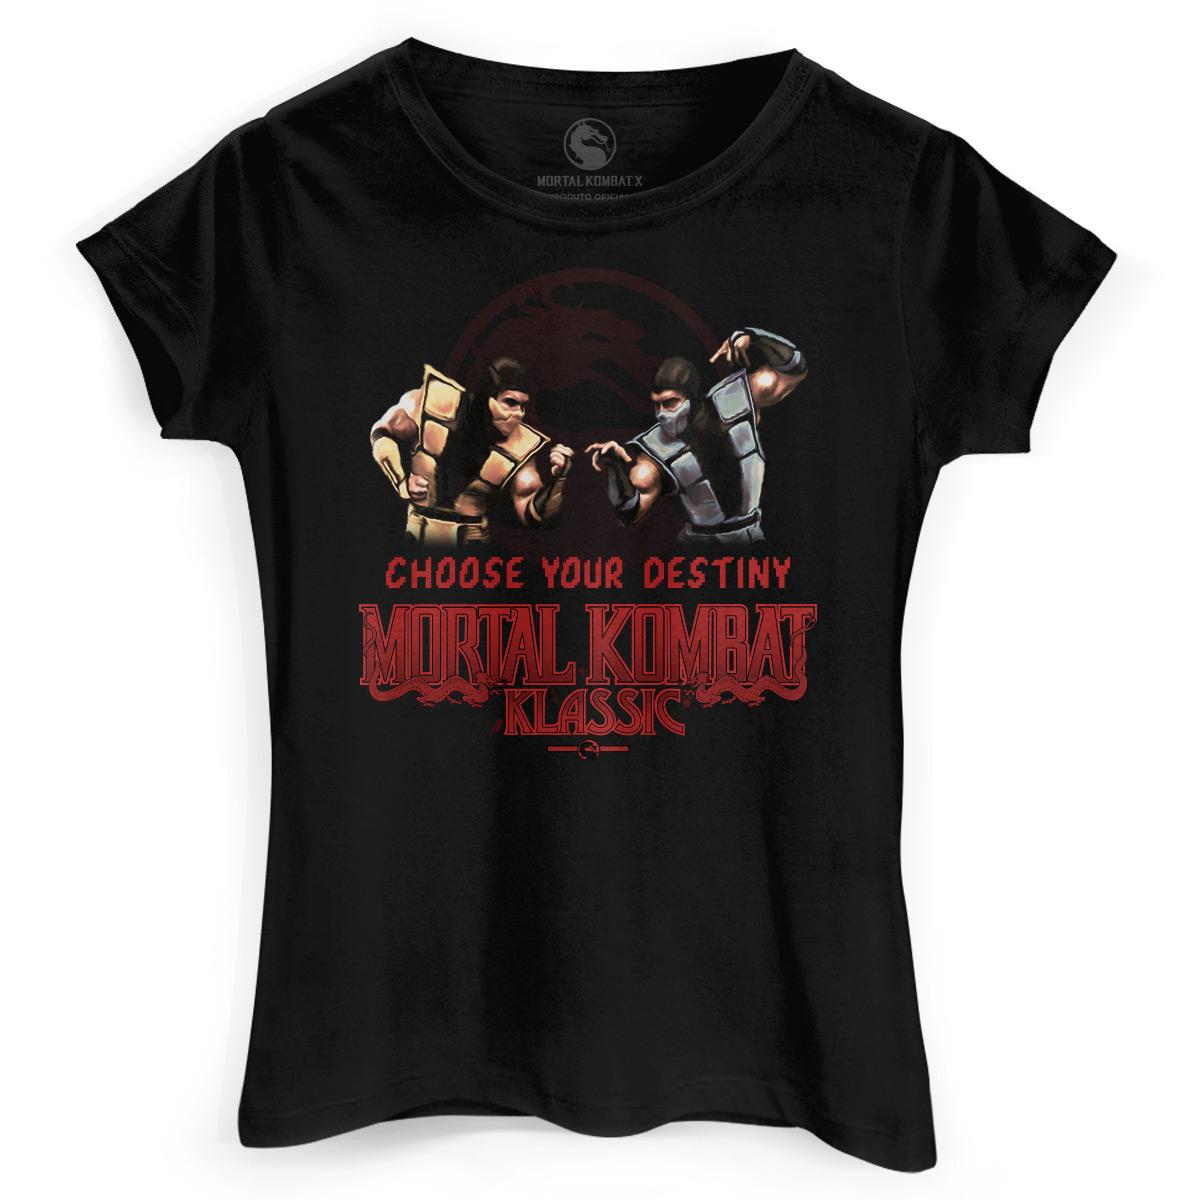 Camiseta Feminina Mortal Kombat Choose Your Destiny